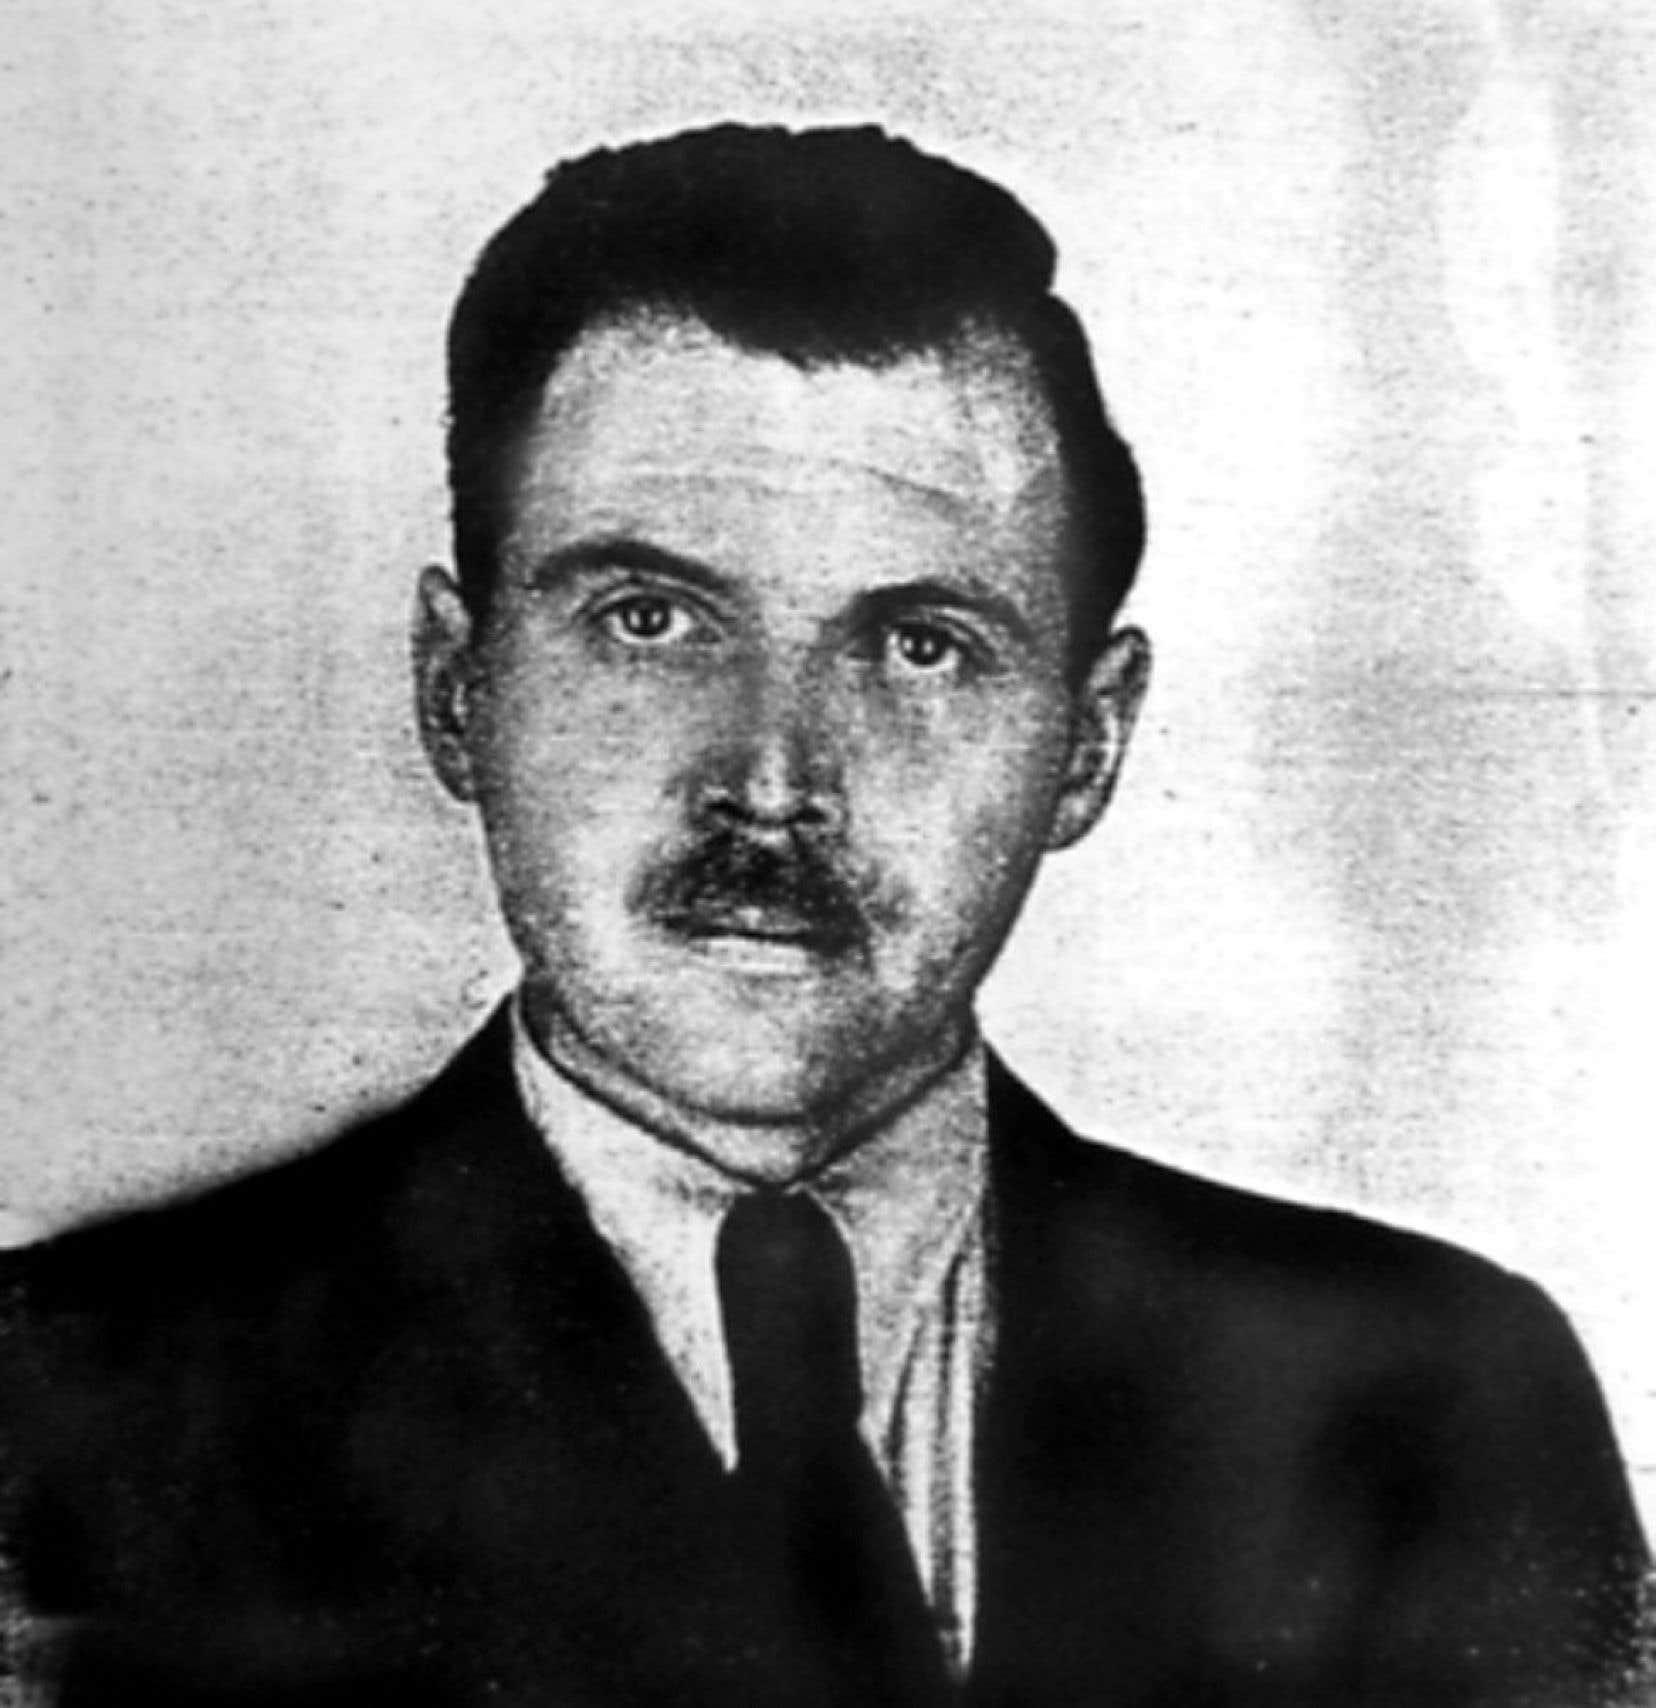 Josef Mengele en 1956